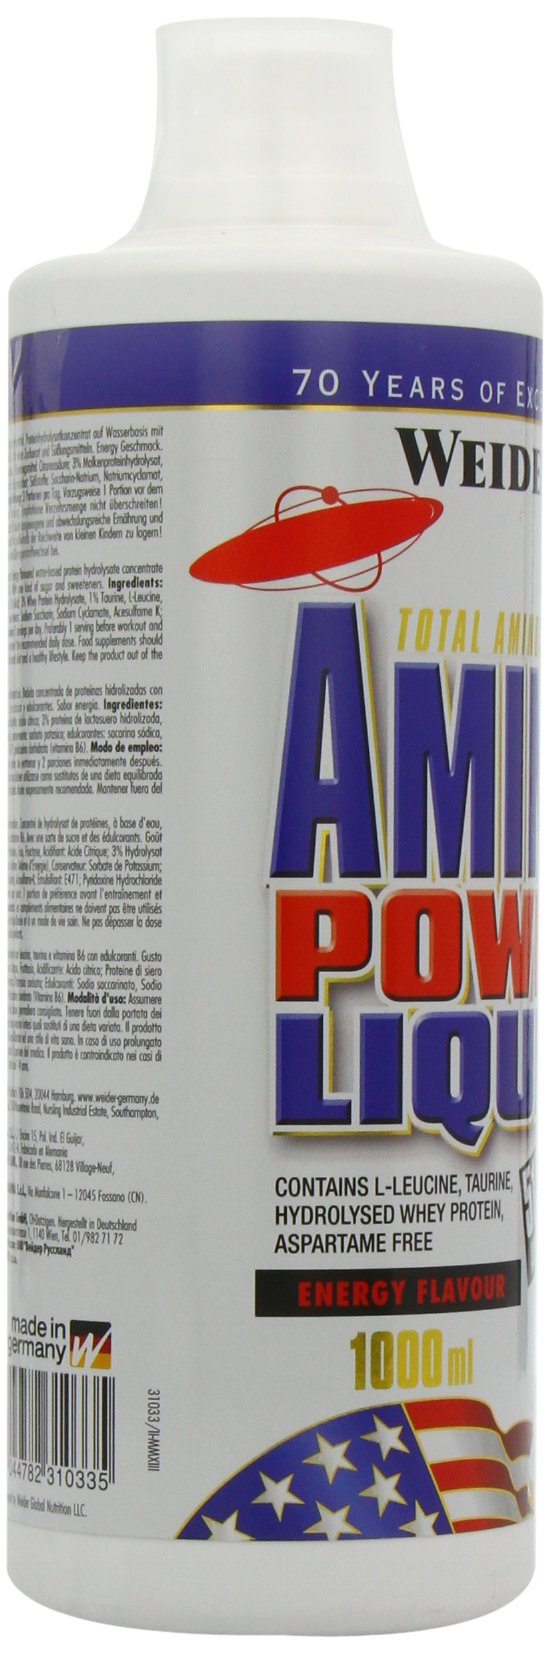 71rmgFHpi2L - Weider Amino Power Liquid 1L Energy, Essential Amino Acids, L-leucine, Free Taurine, Vitamin B8